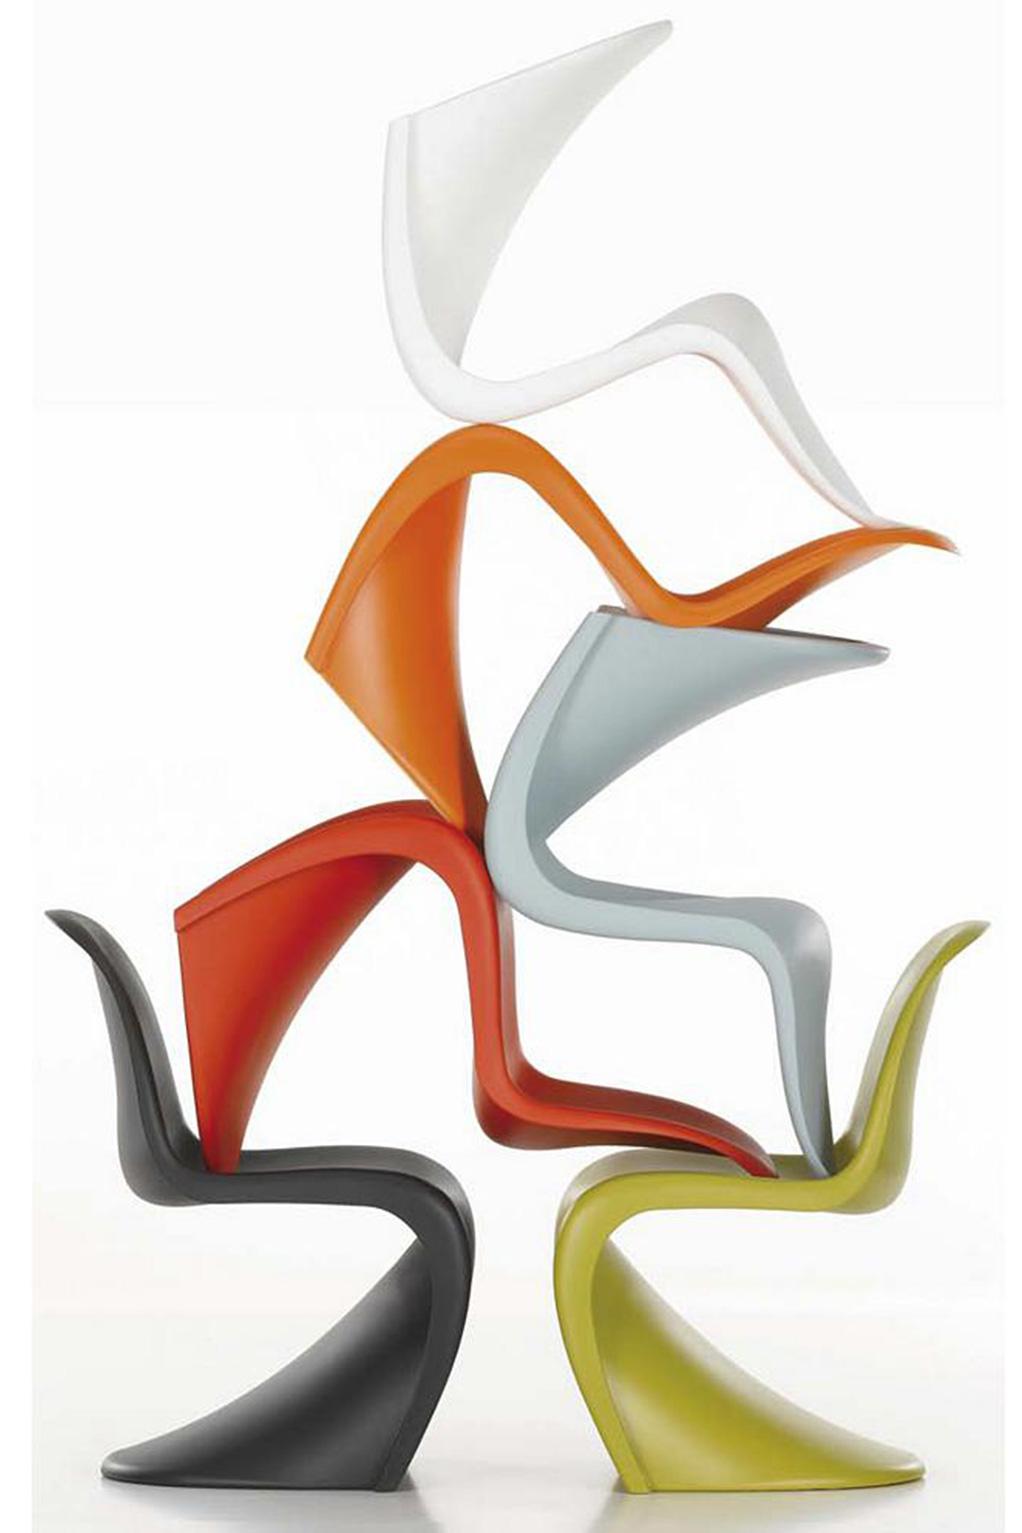 Verner Panton's Panton Chair (1999) for Vitra